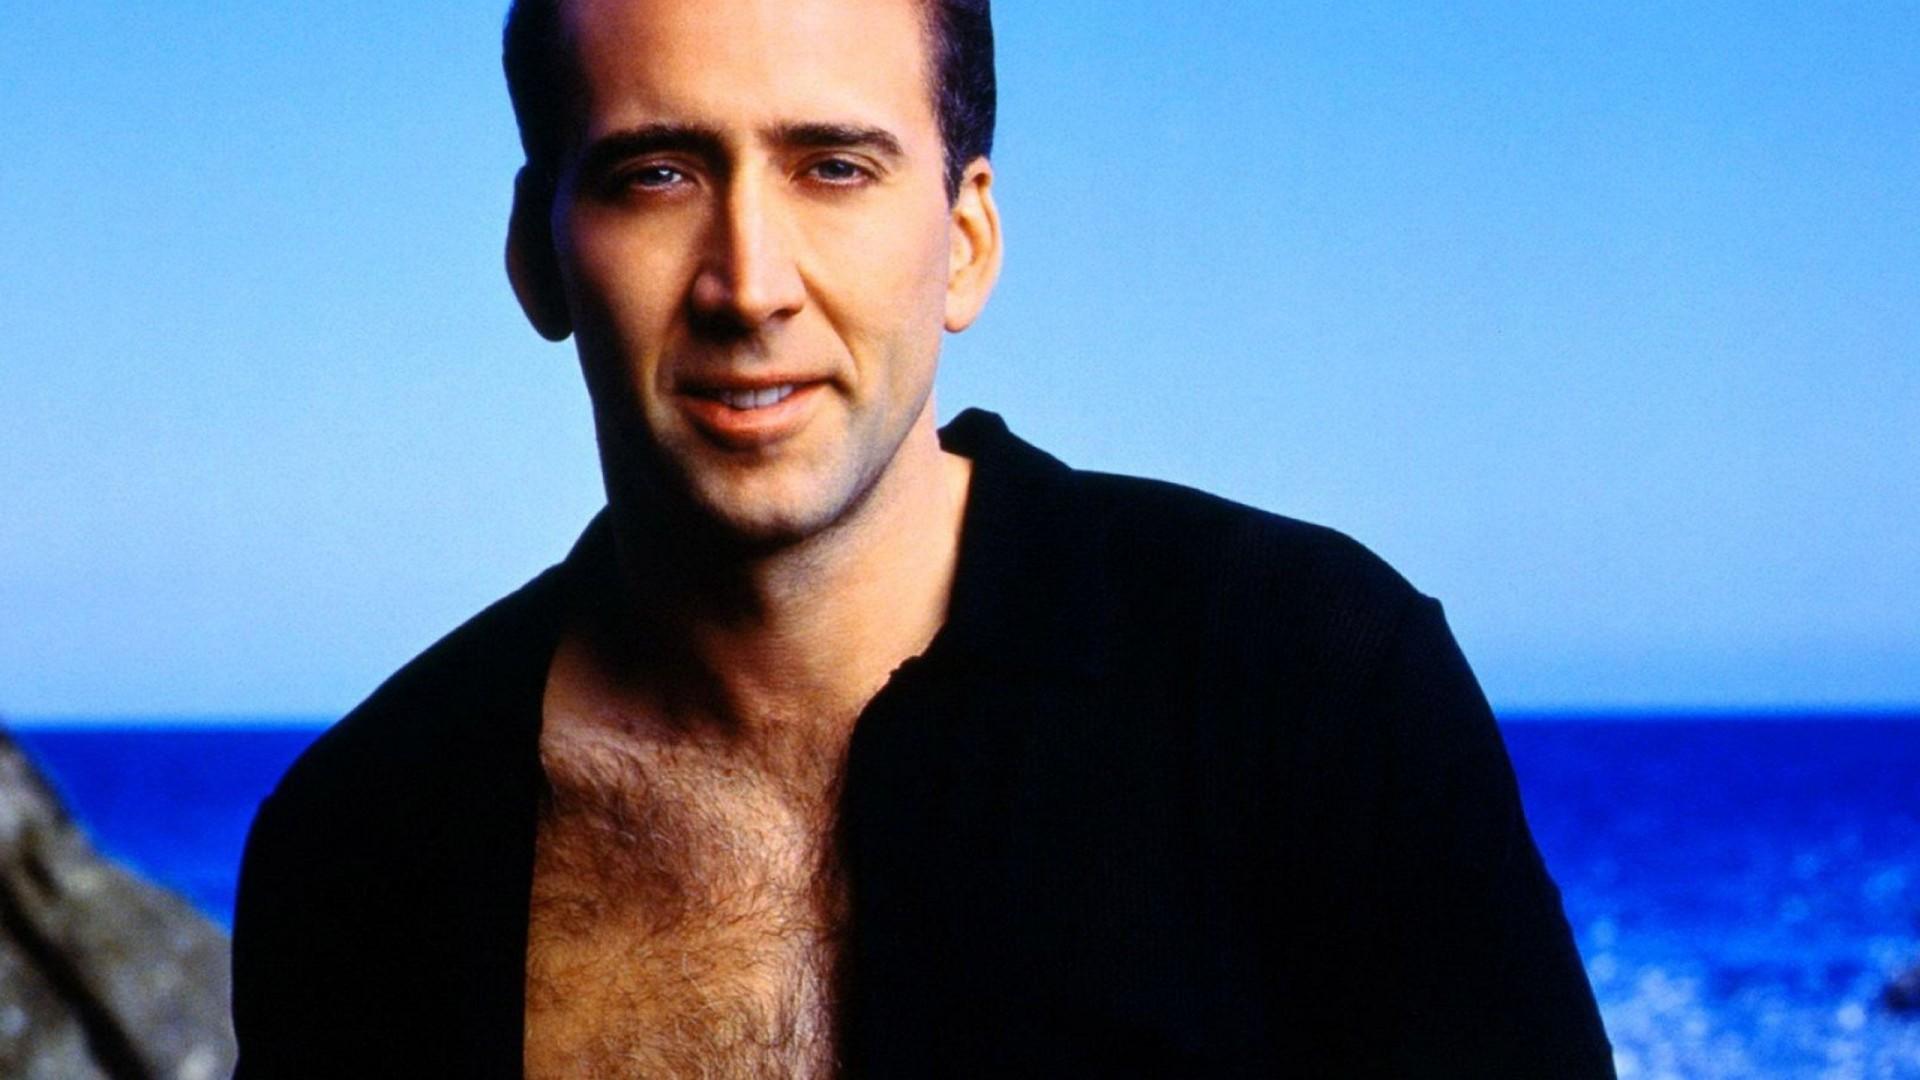 100% Correct Nicolas Cage Character Rankings